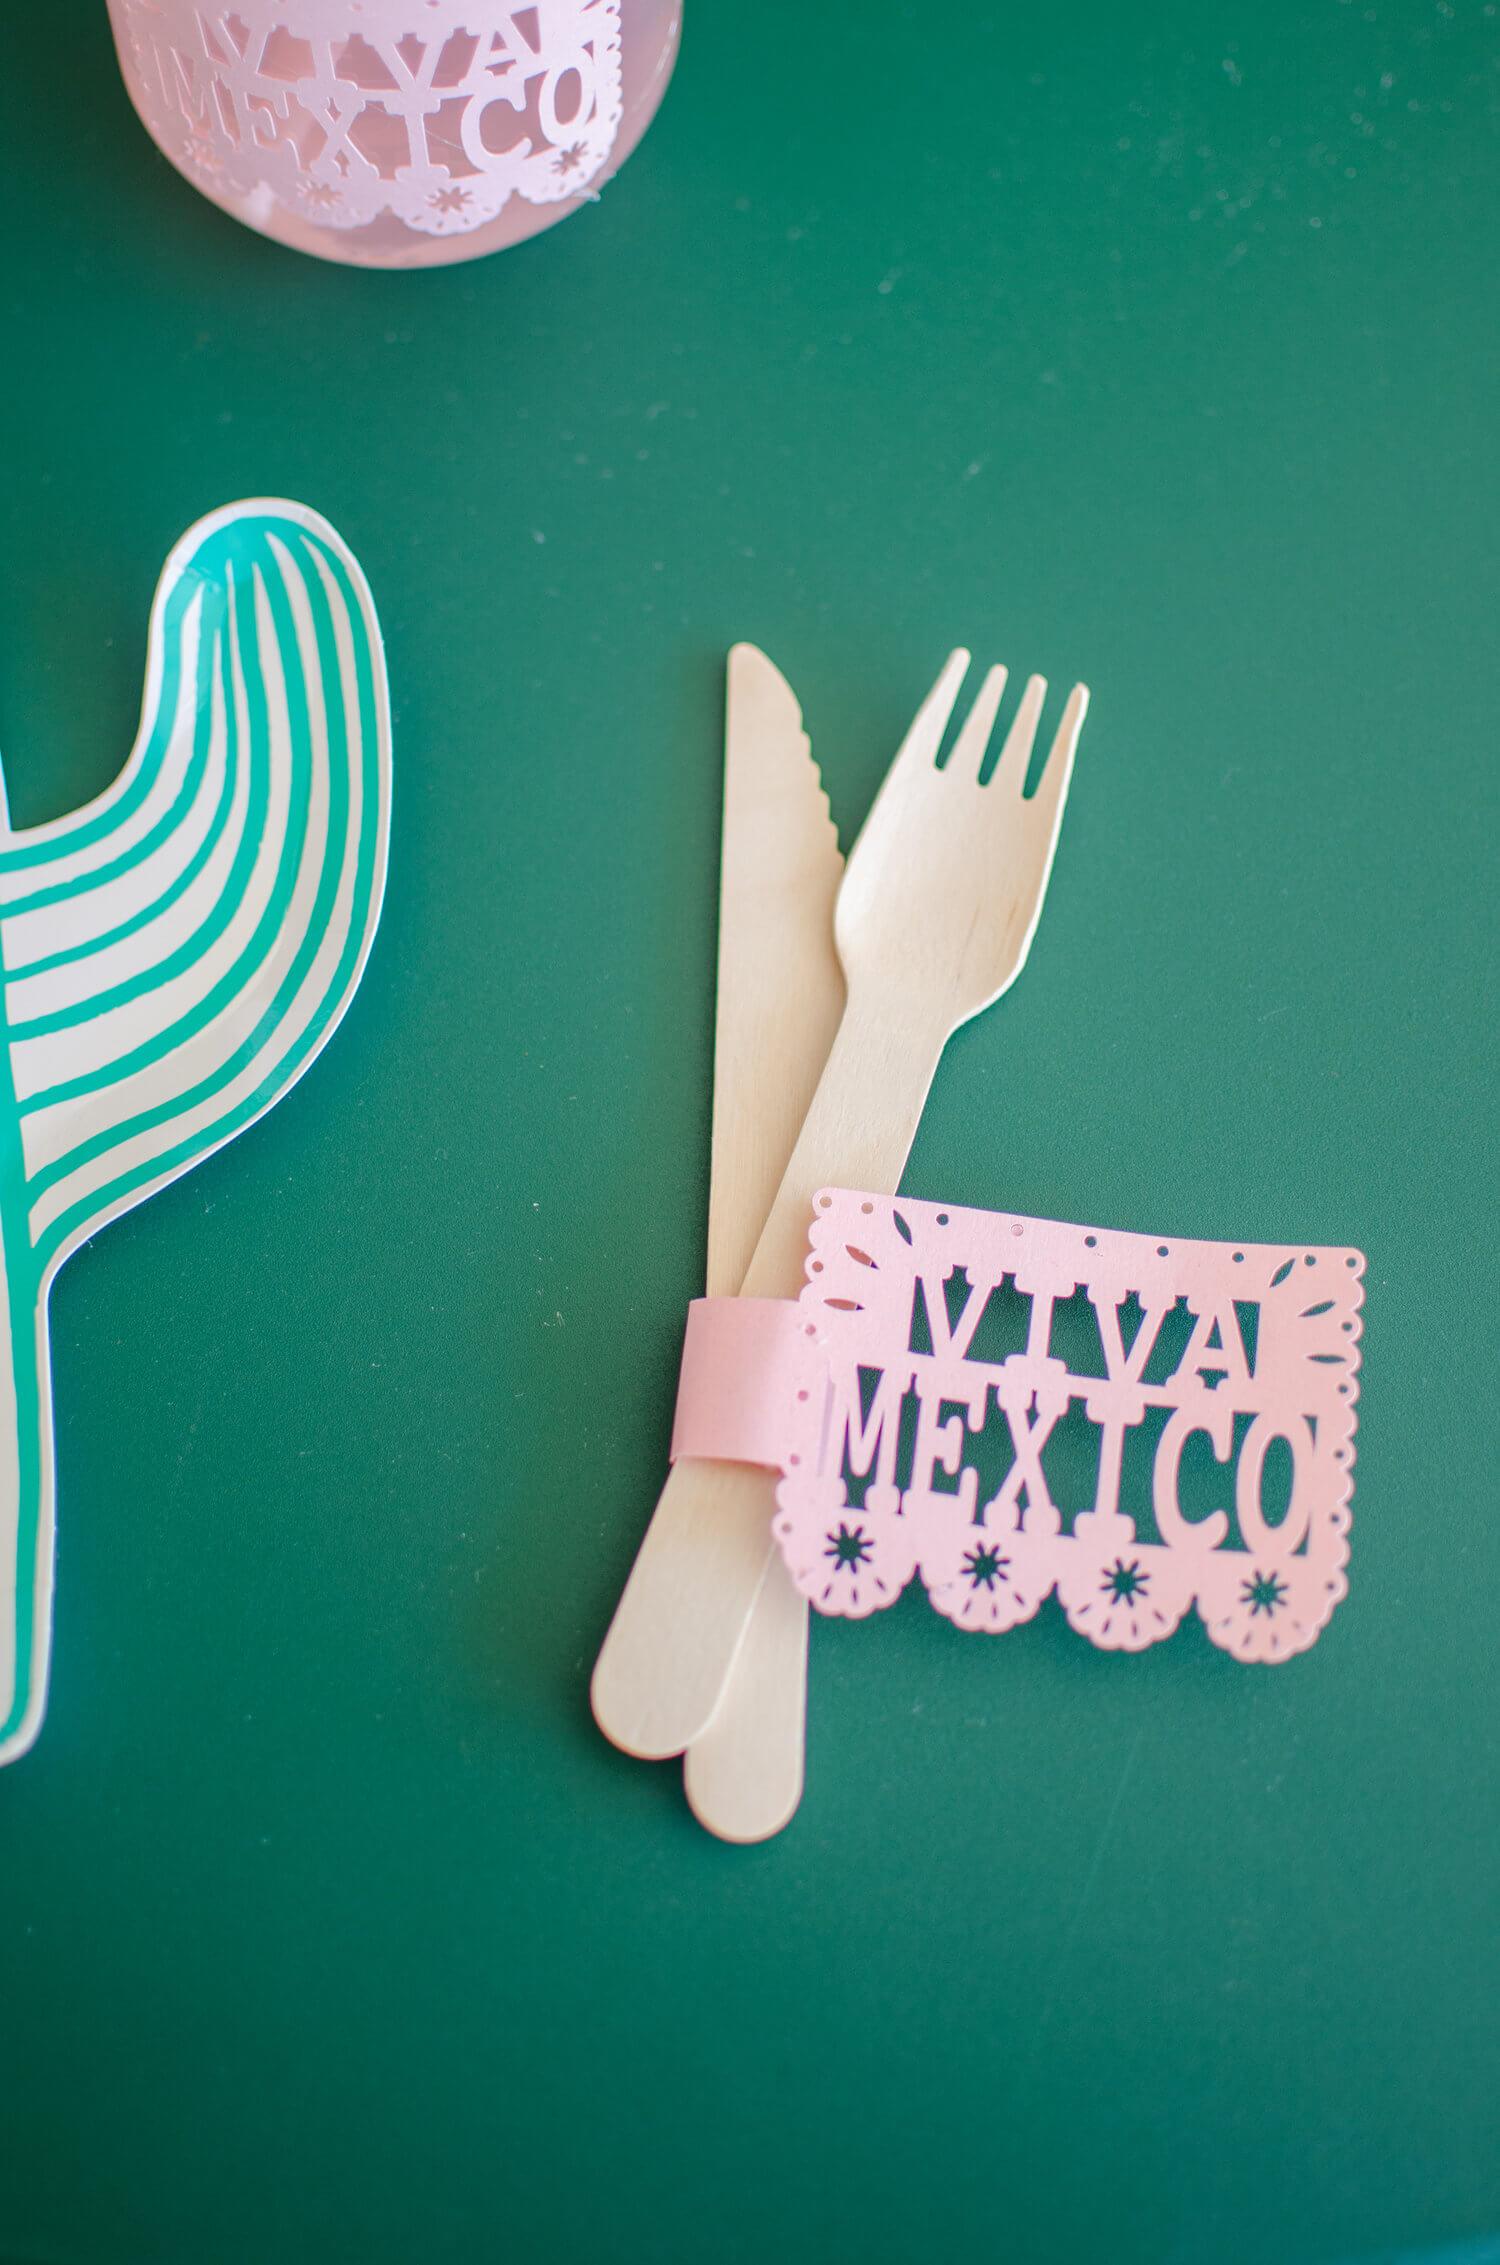 Cinco de Mayo tablescape / Cactus plates / Southwestern party ideas / Cinco de Mayo party ideas / Viva Mexico / Southwestern tablescape / Styled by Carolina from MINT Event Design / www.minteventdesign.com